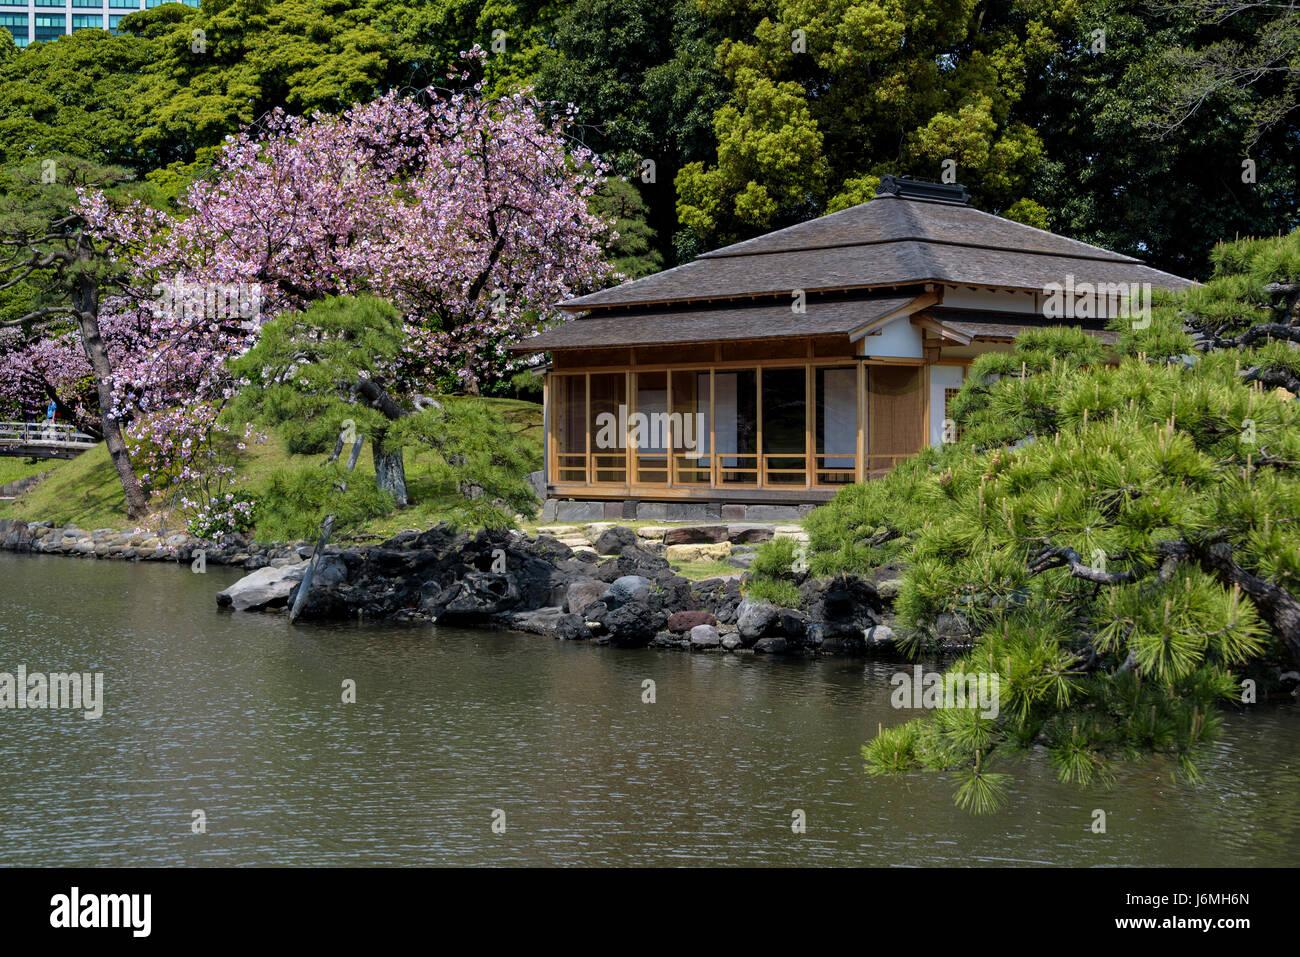 Tetería trague o no Tsubame Ochaya, Hama Rikyu jardines japoneses. Imagen De Stock